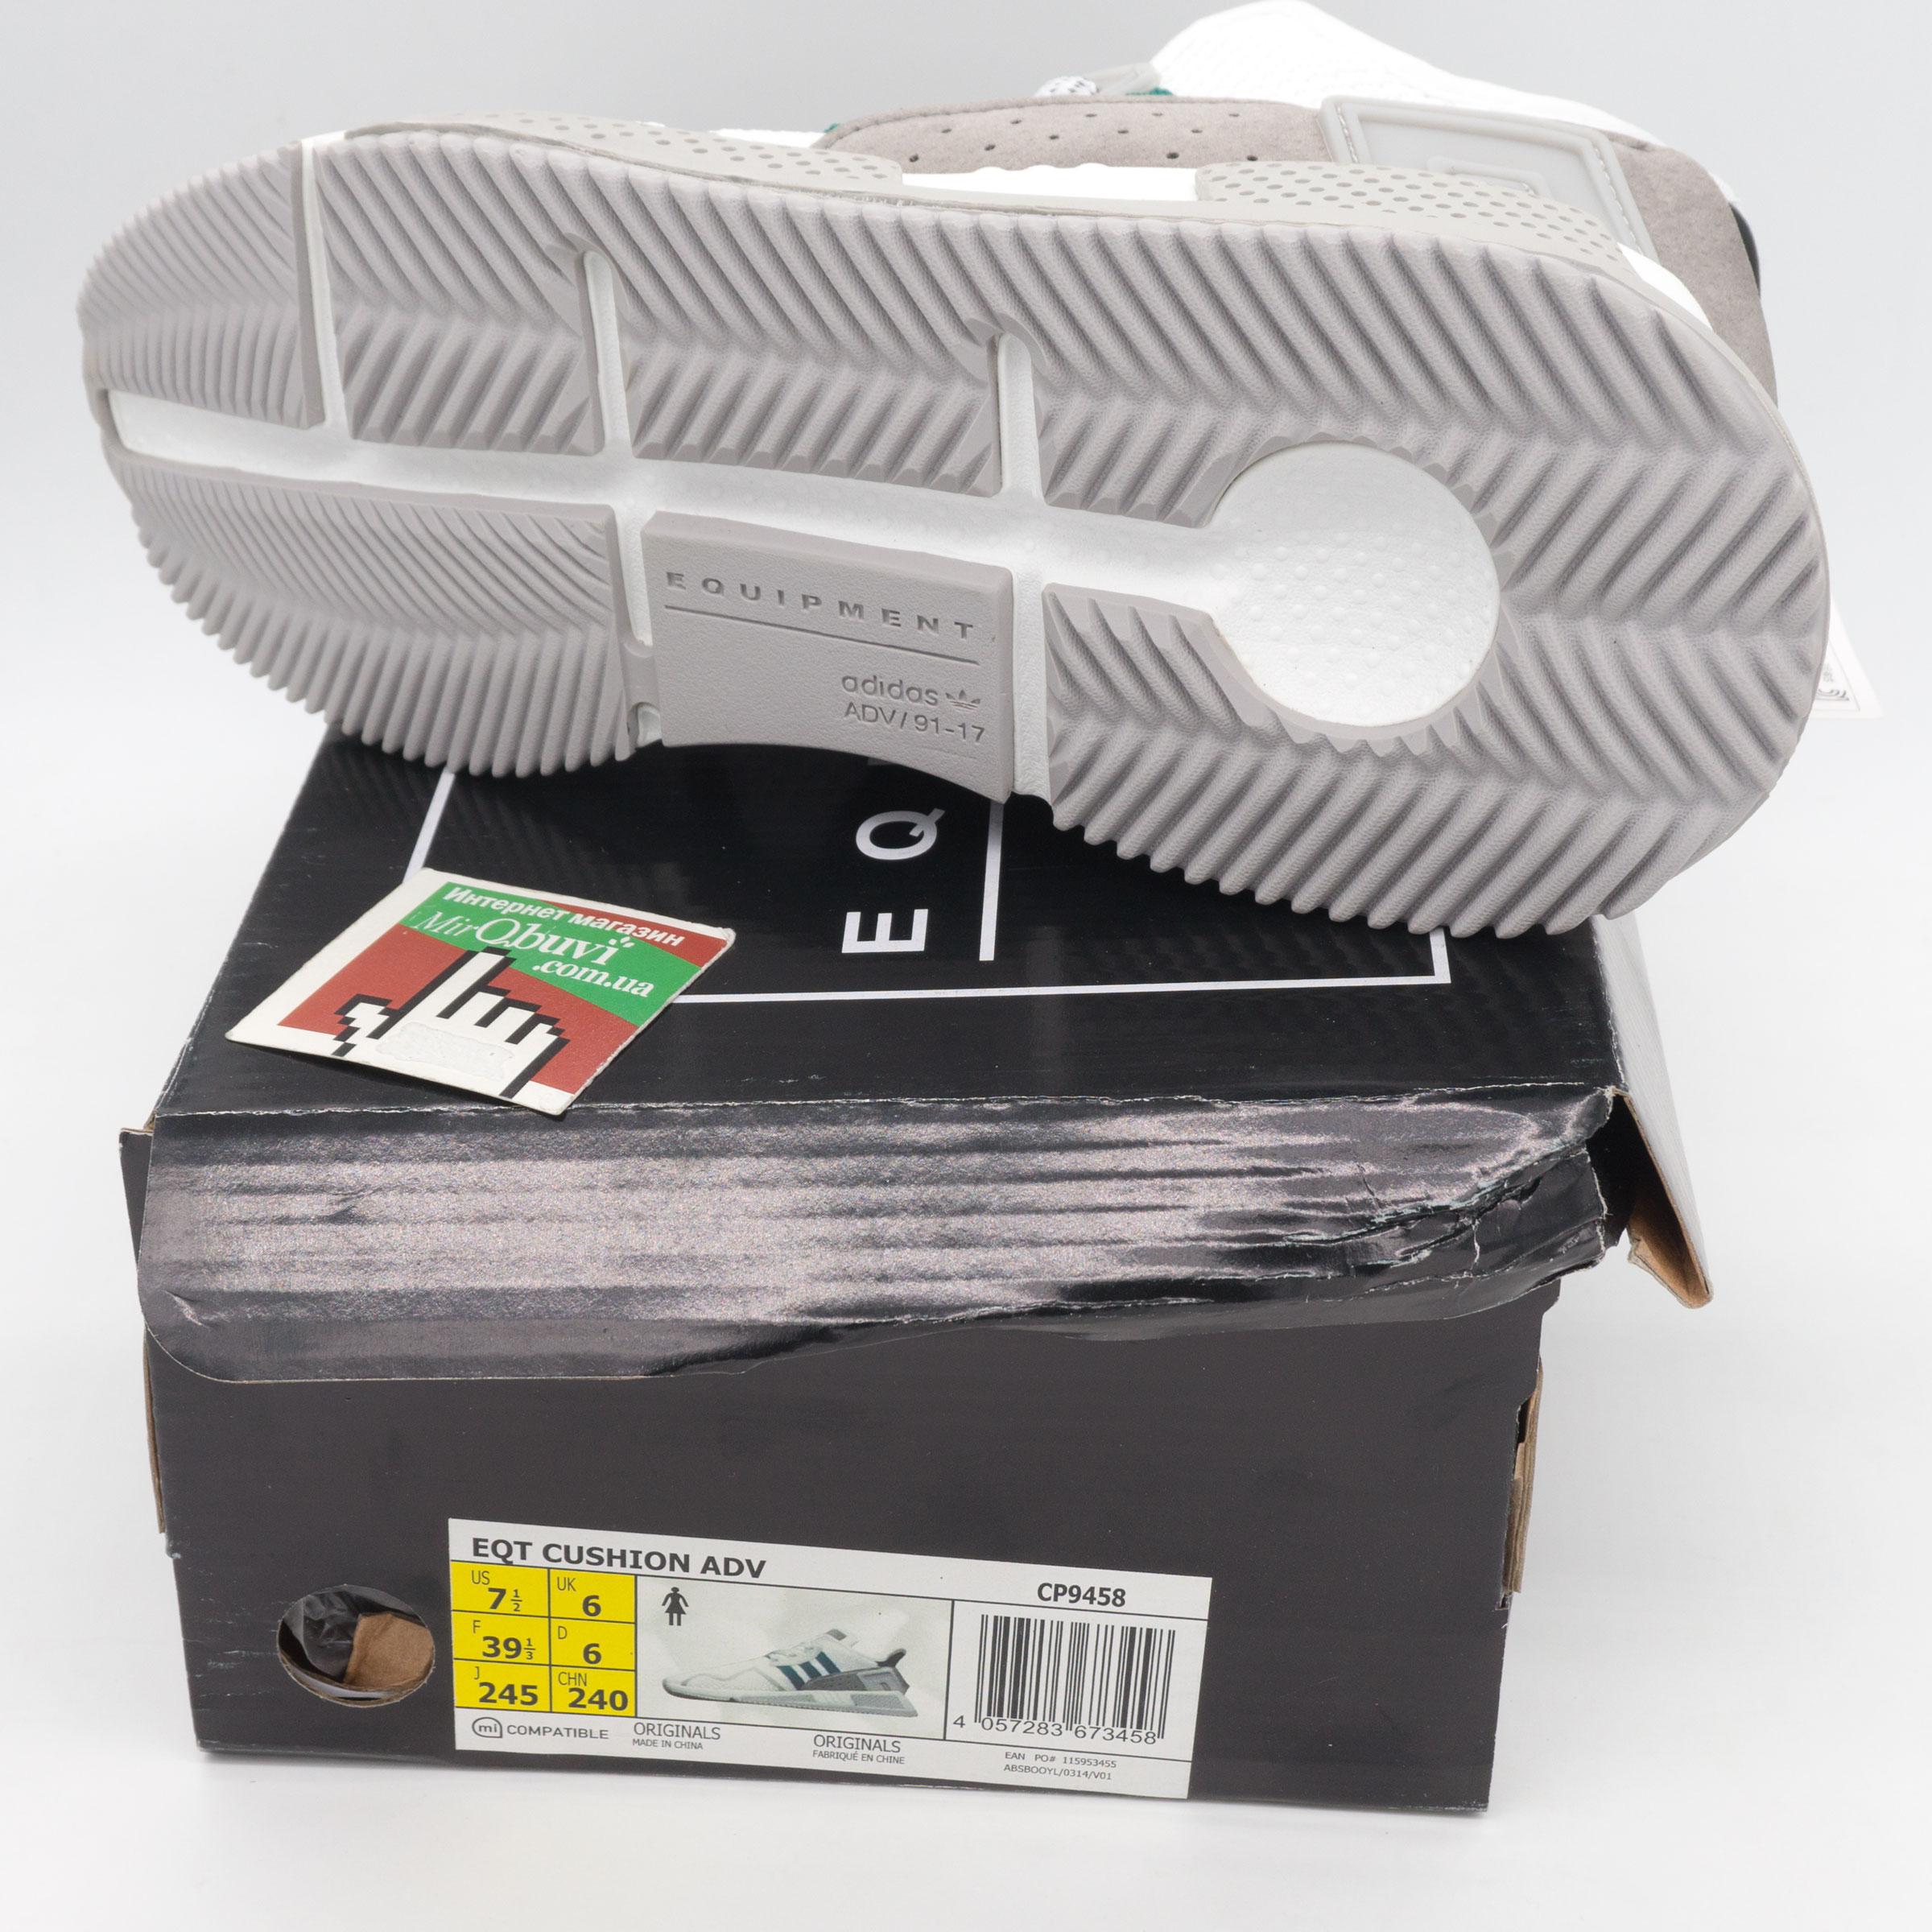 фото bottom Кроссовки Adidas EQT Cushion adv белые с зеленым. Топ качество! bottom